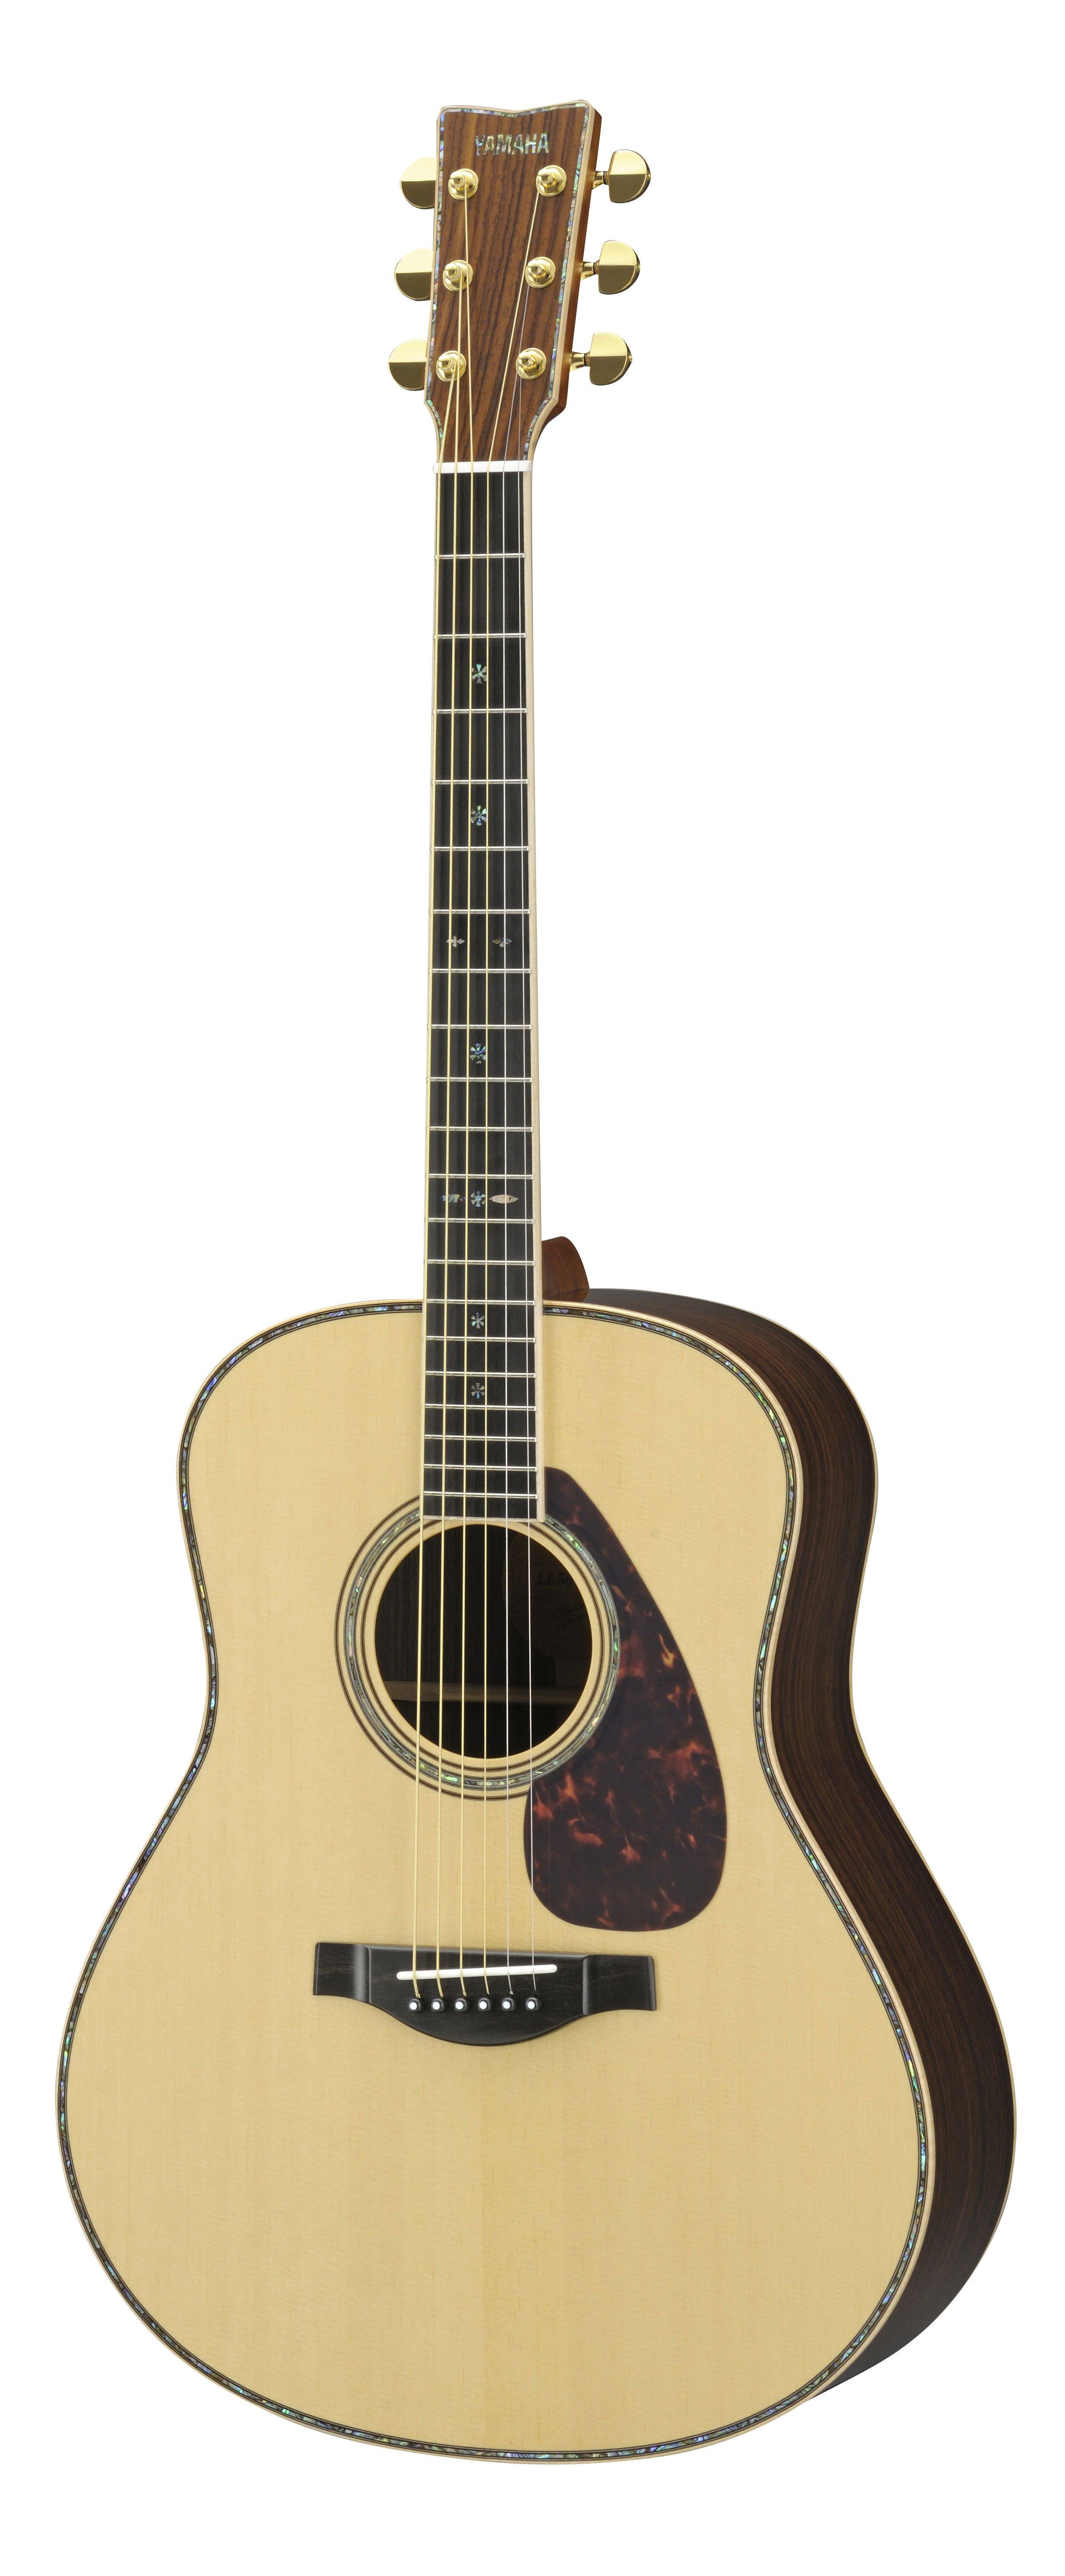 L Series - LL Series - Acoustic Guitars - Guitars & Basses